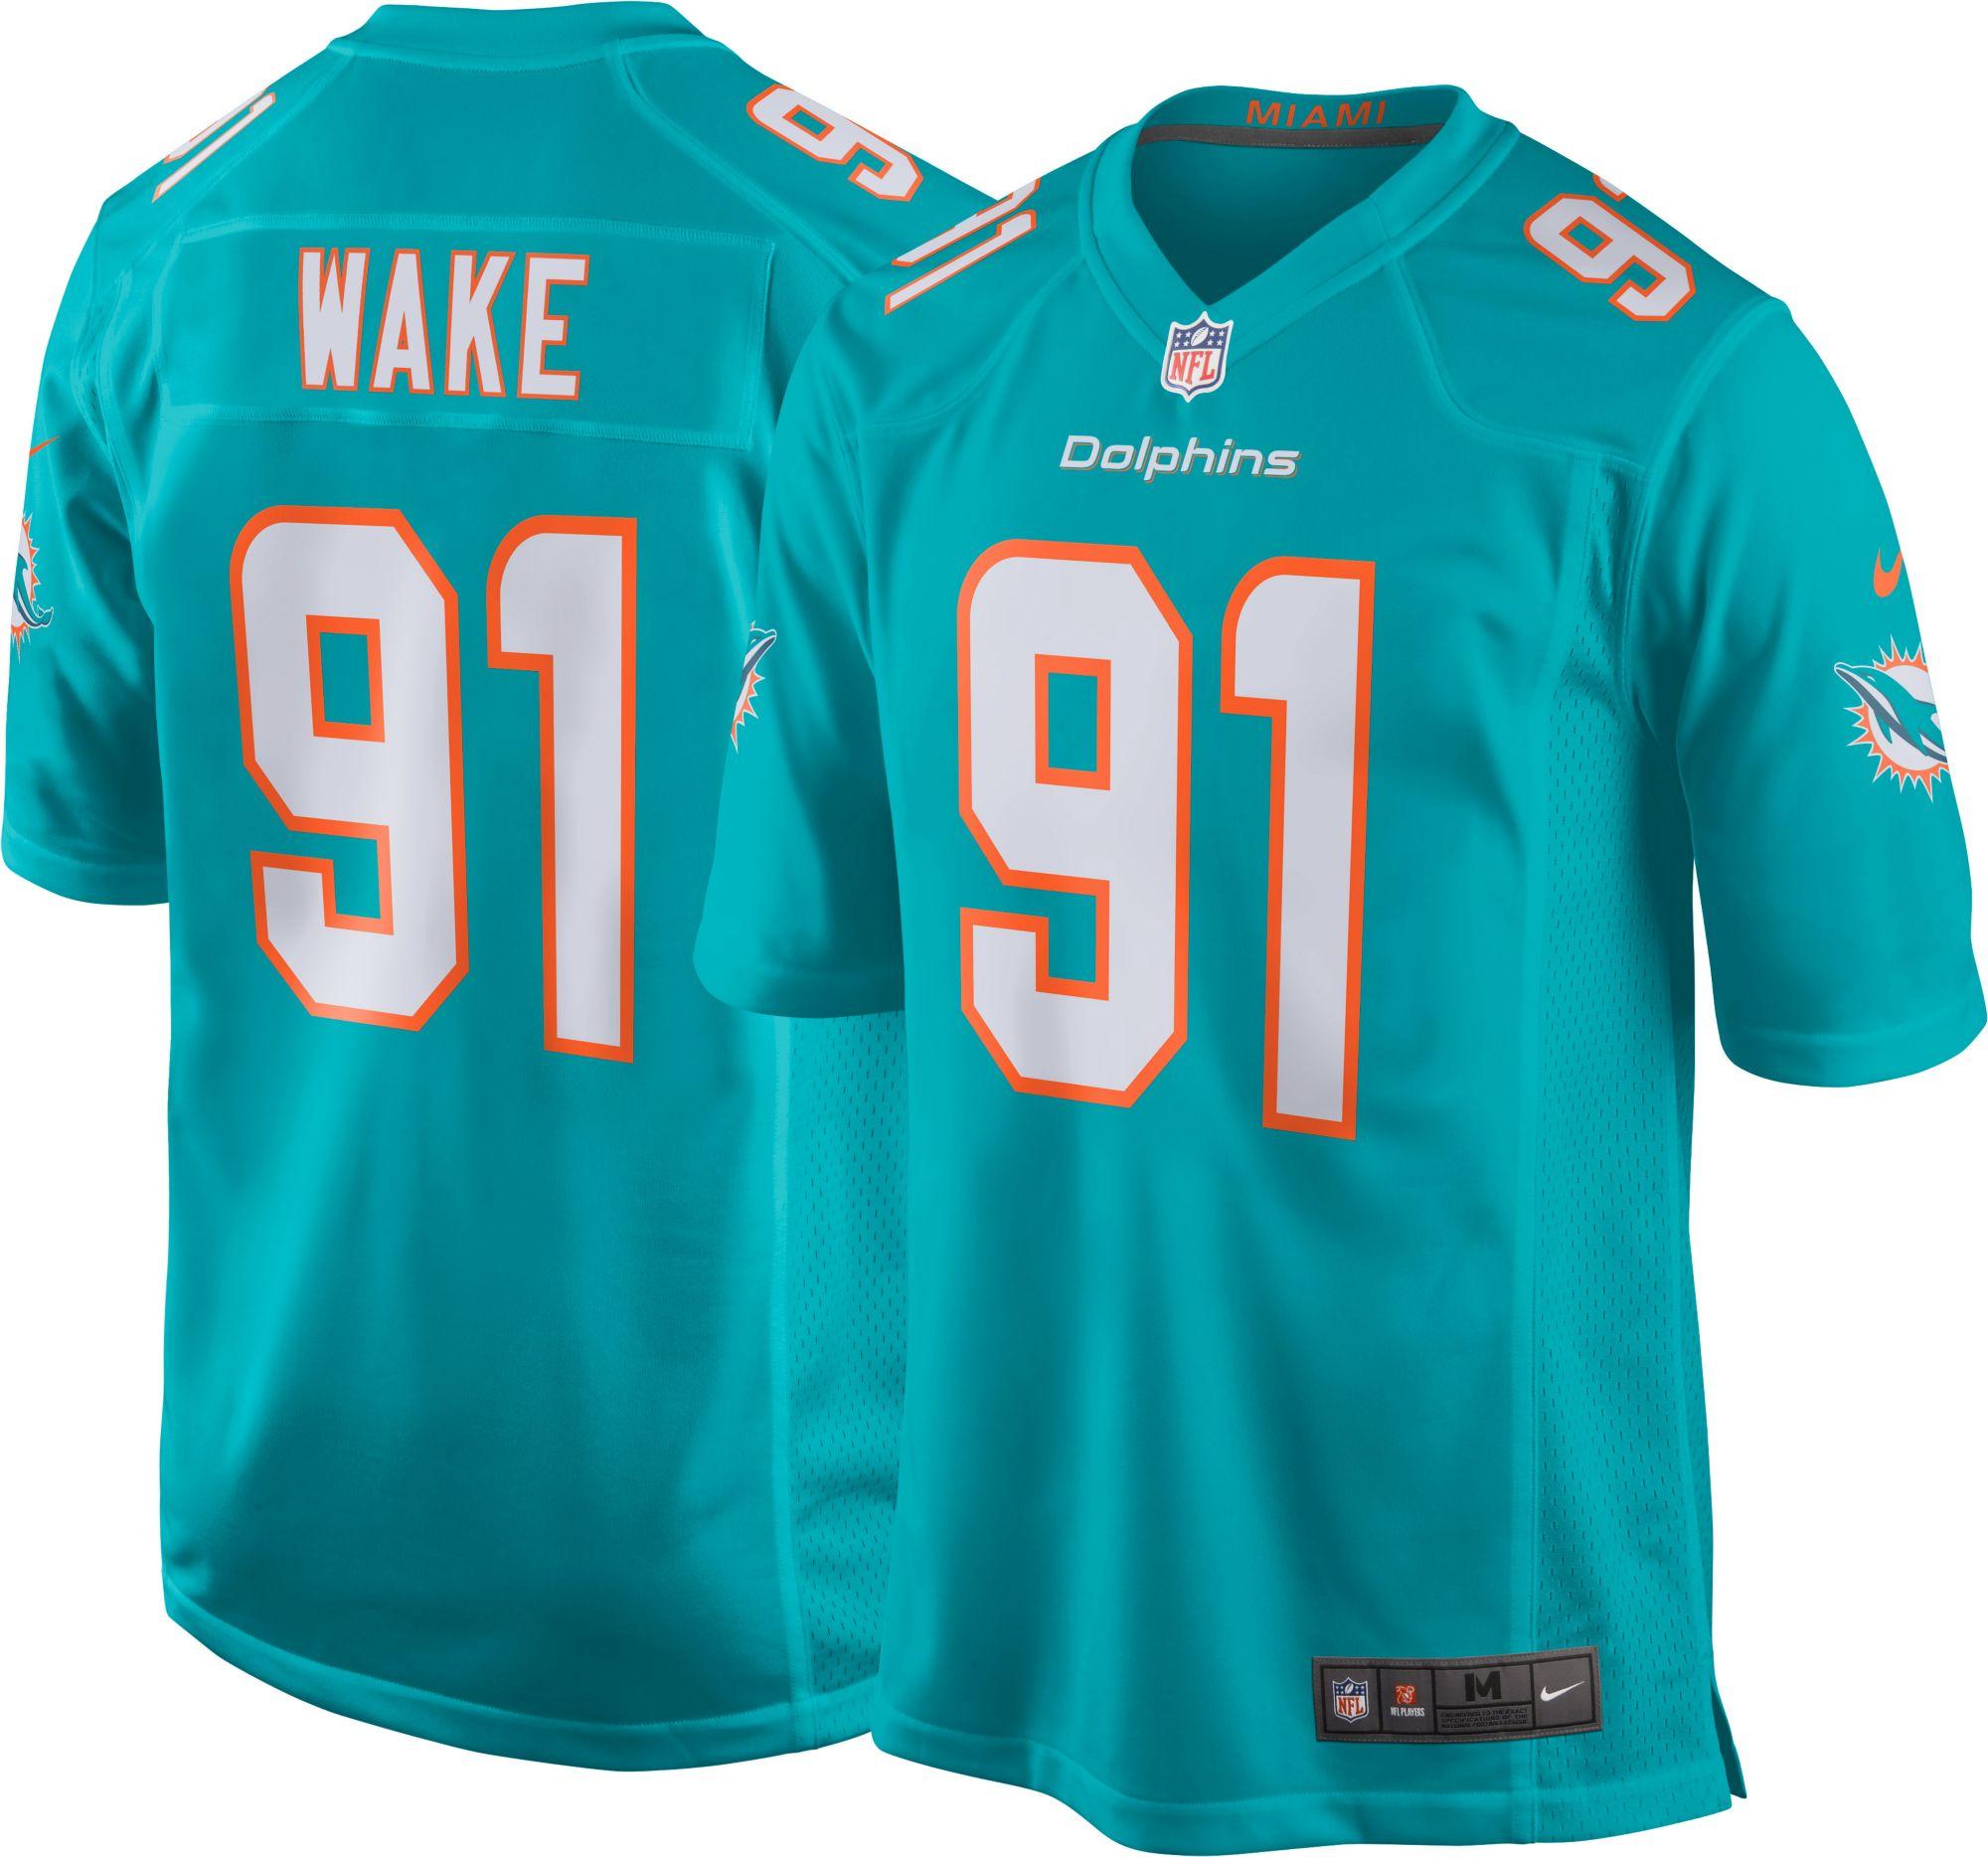 cameron wake signed jersey